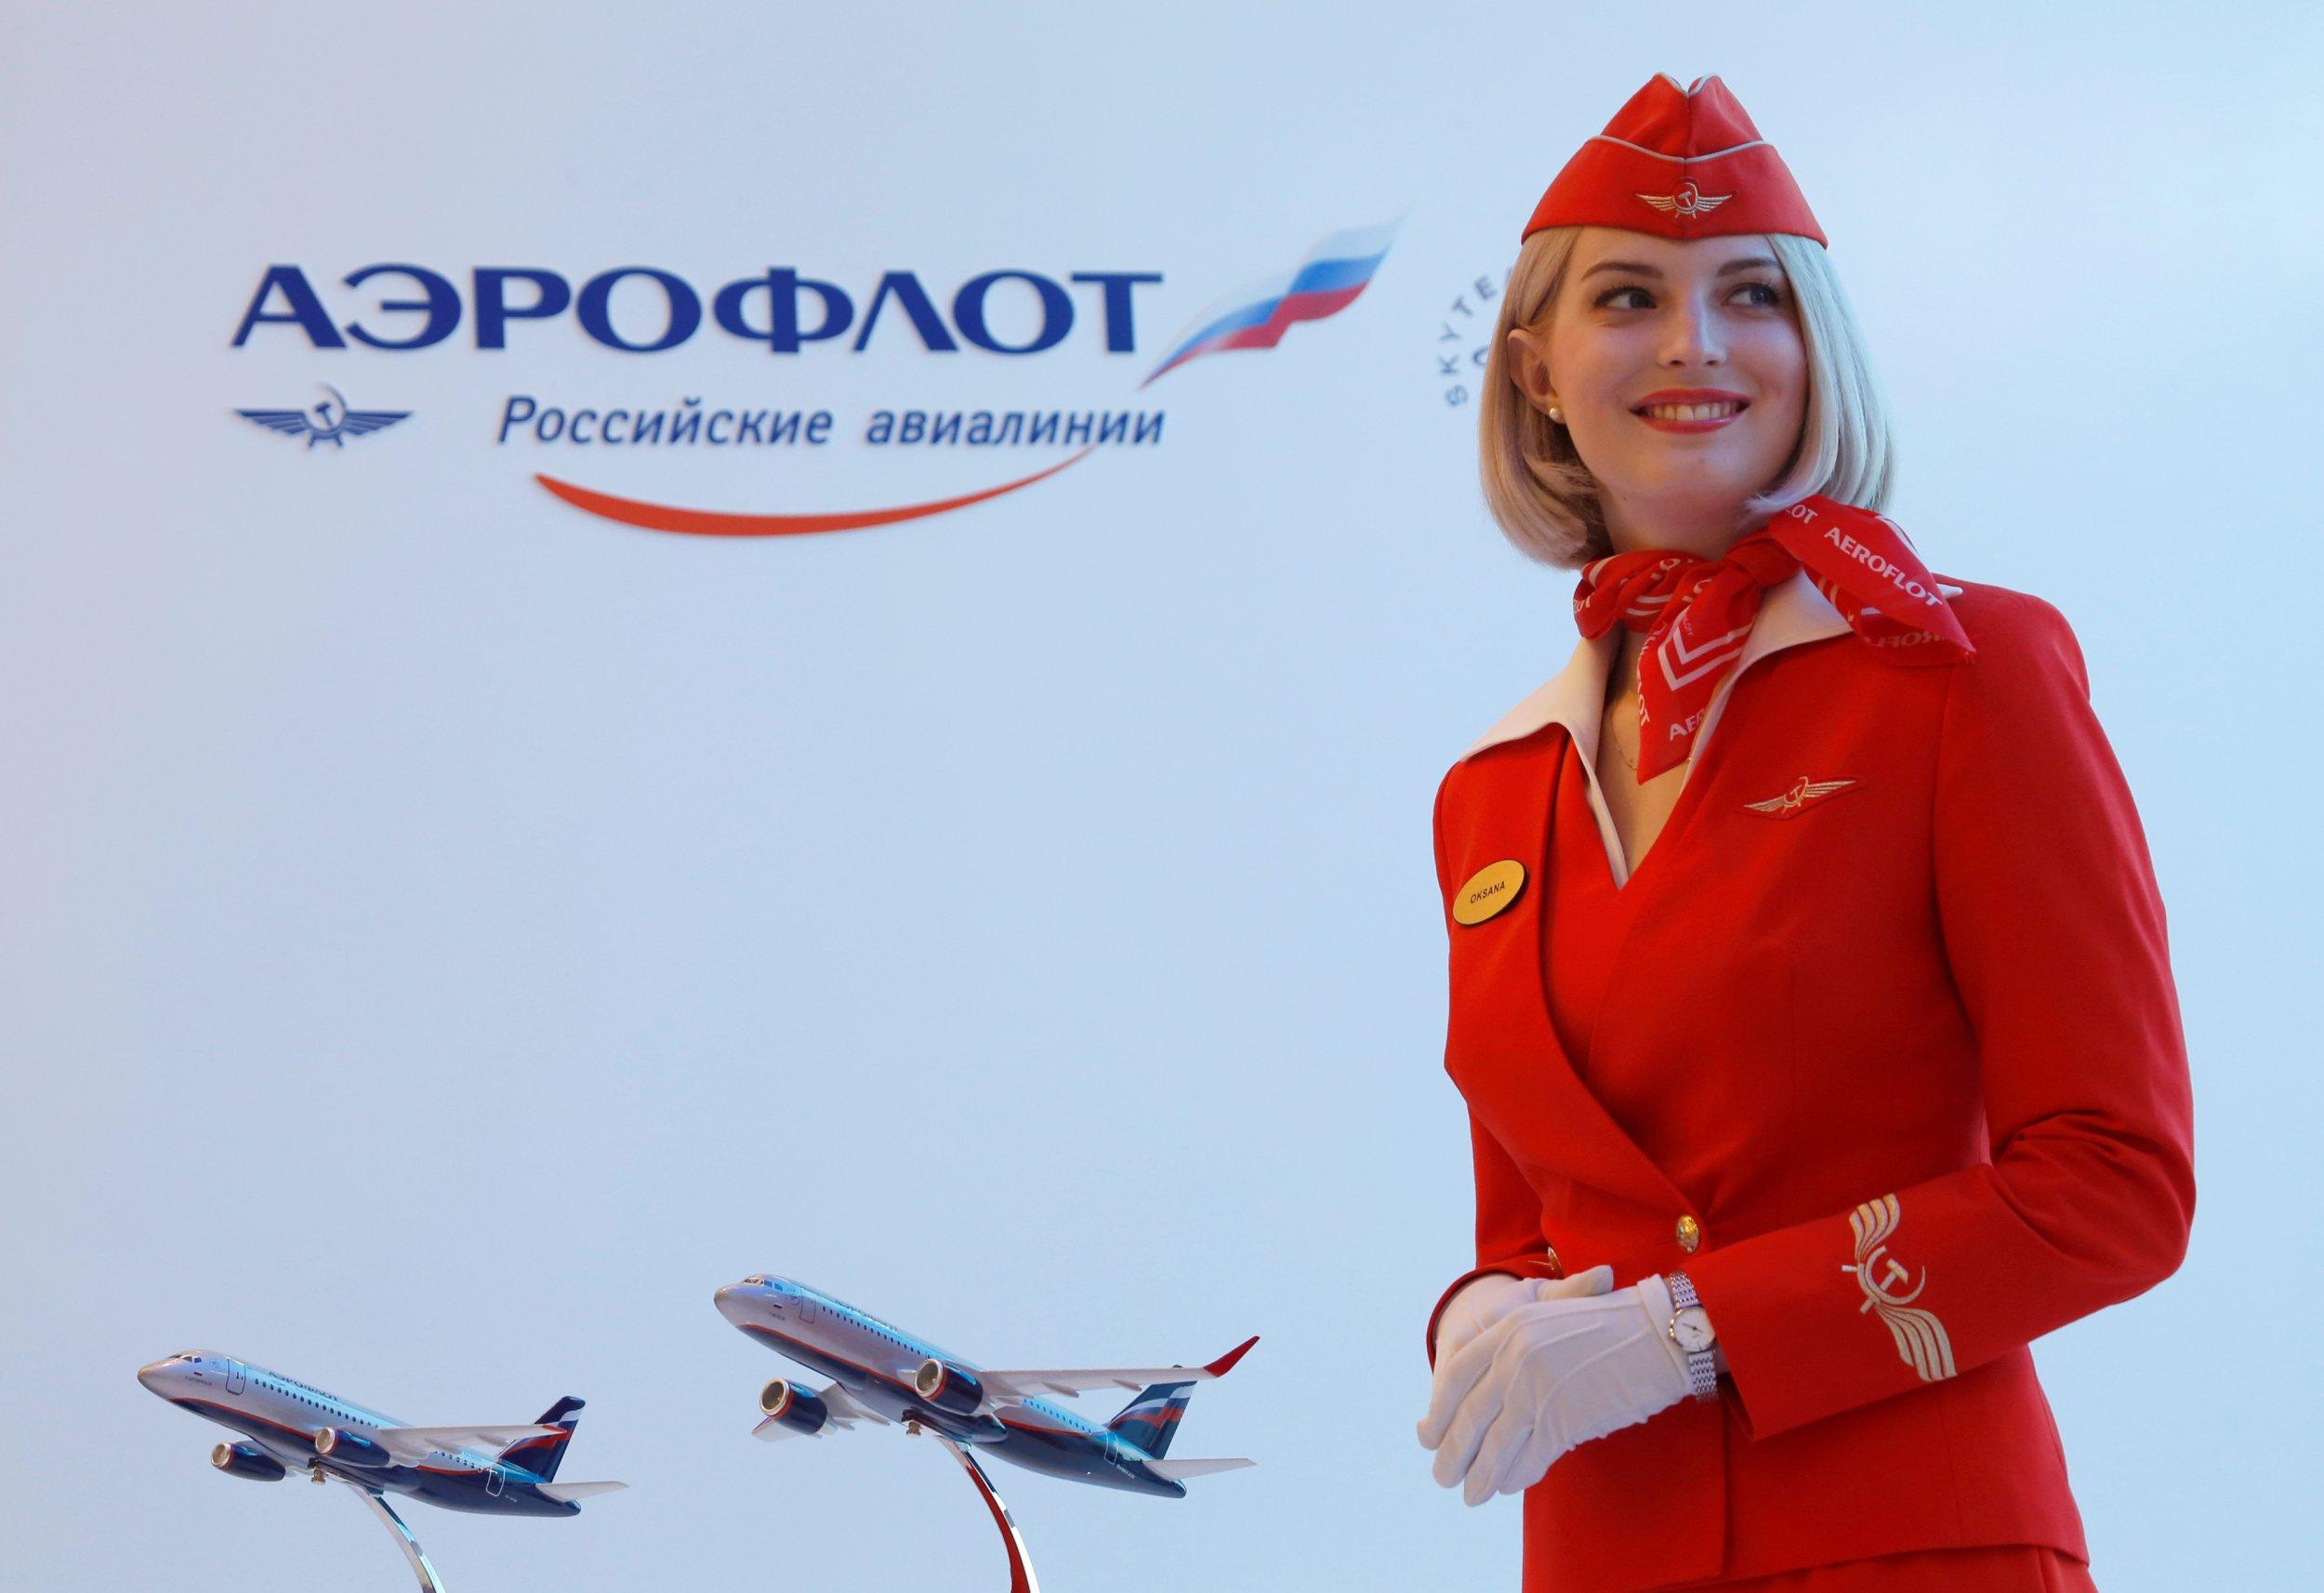 Aeroflot employee